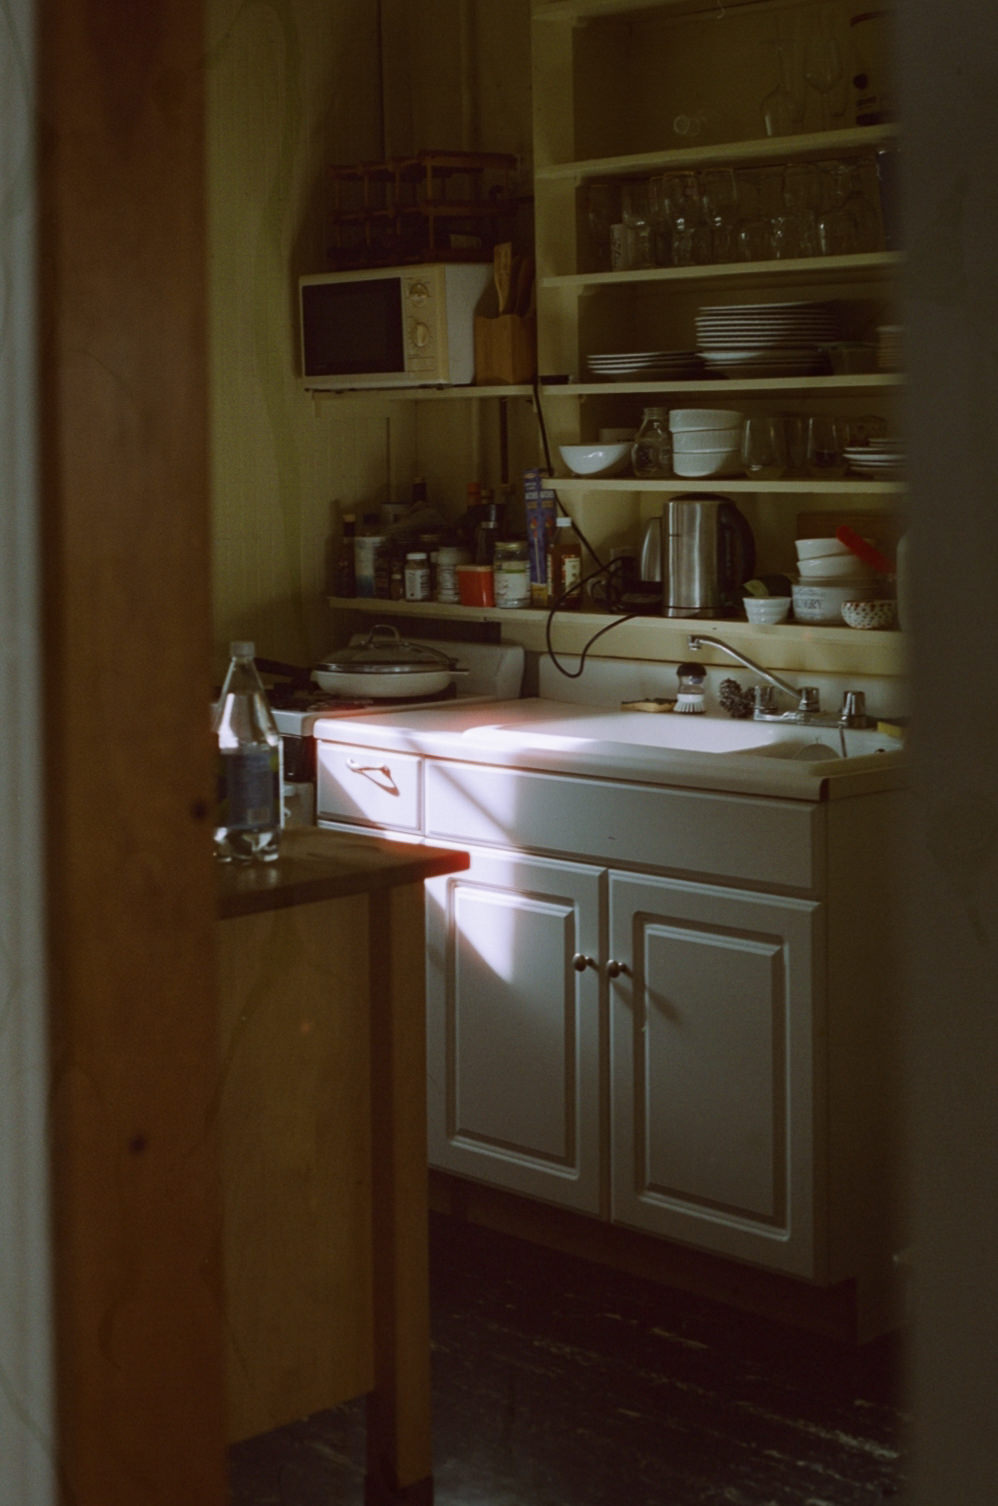 171212-kirby-gladstein-photography-cinestill-50-houston-los-angeles-017.jpg